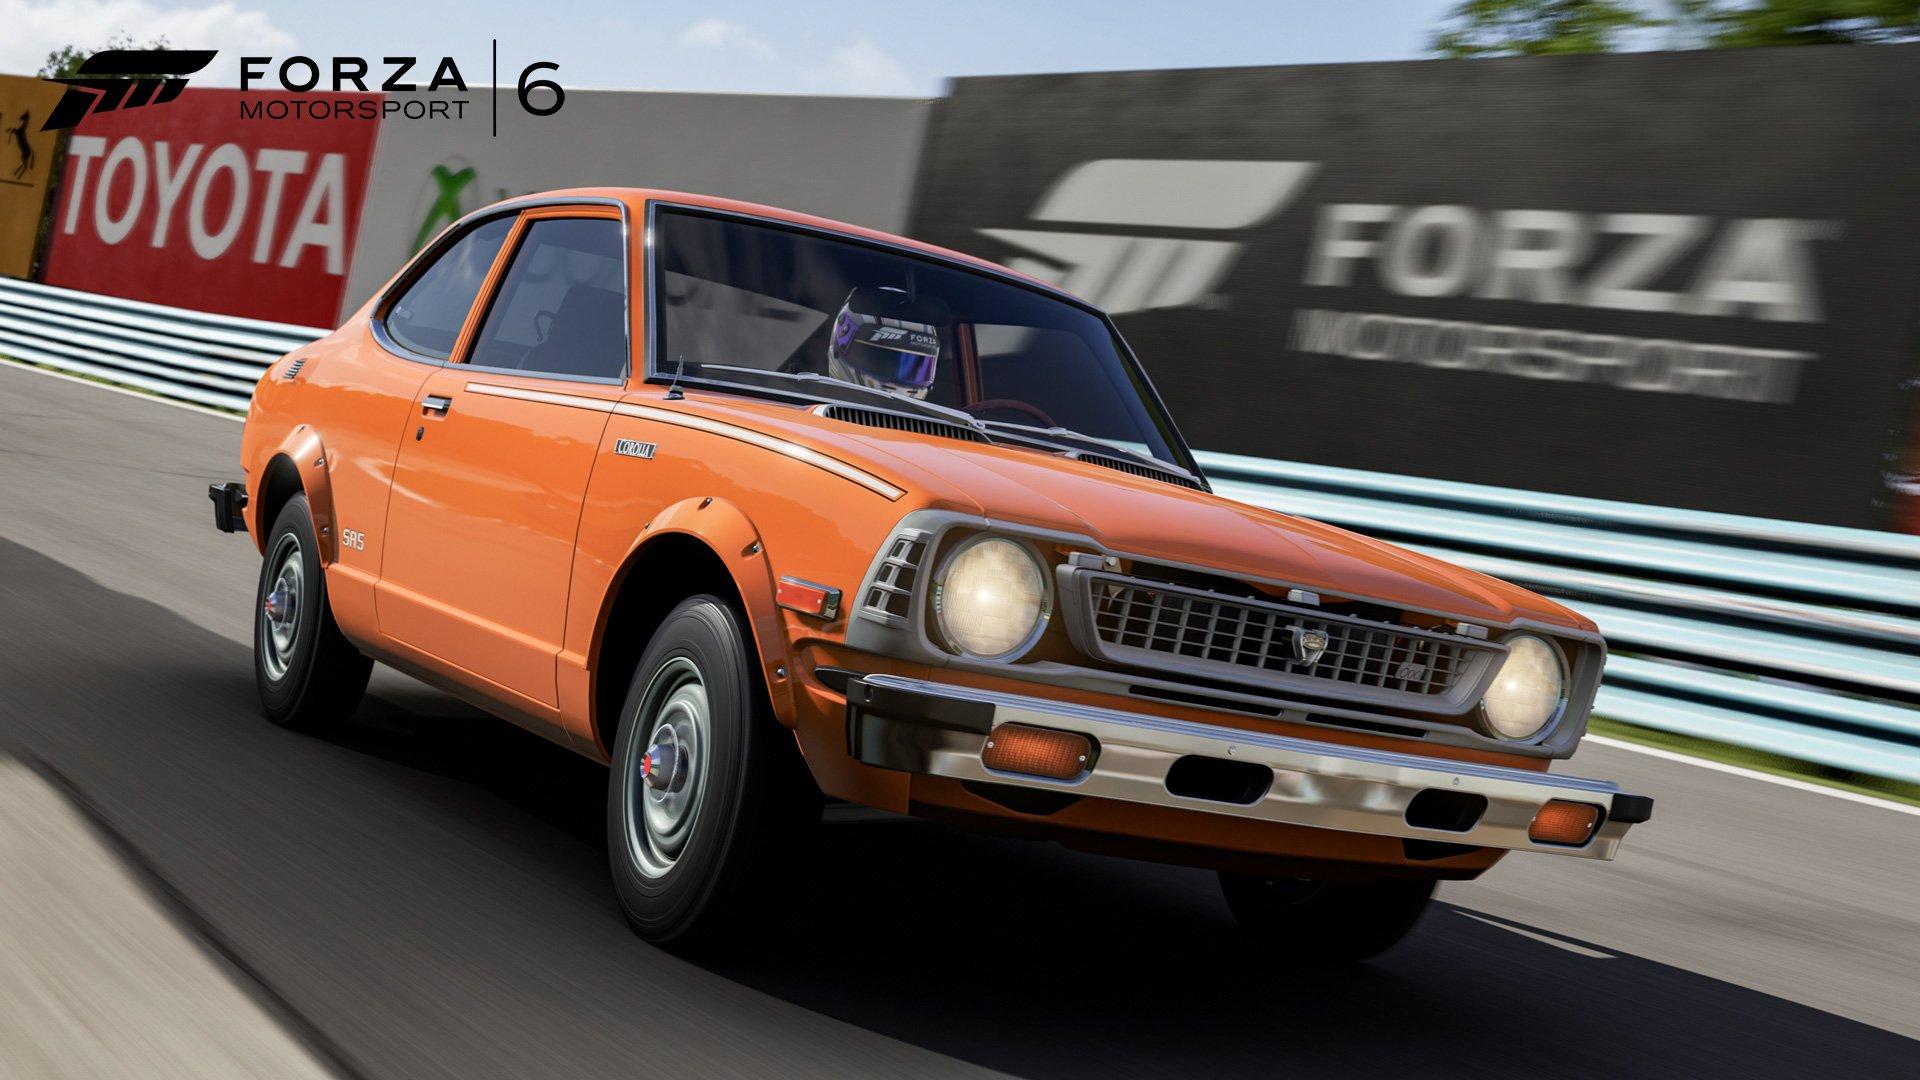 1974 Toyota Corolla SR5 Forza Motorsport 6